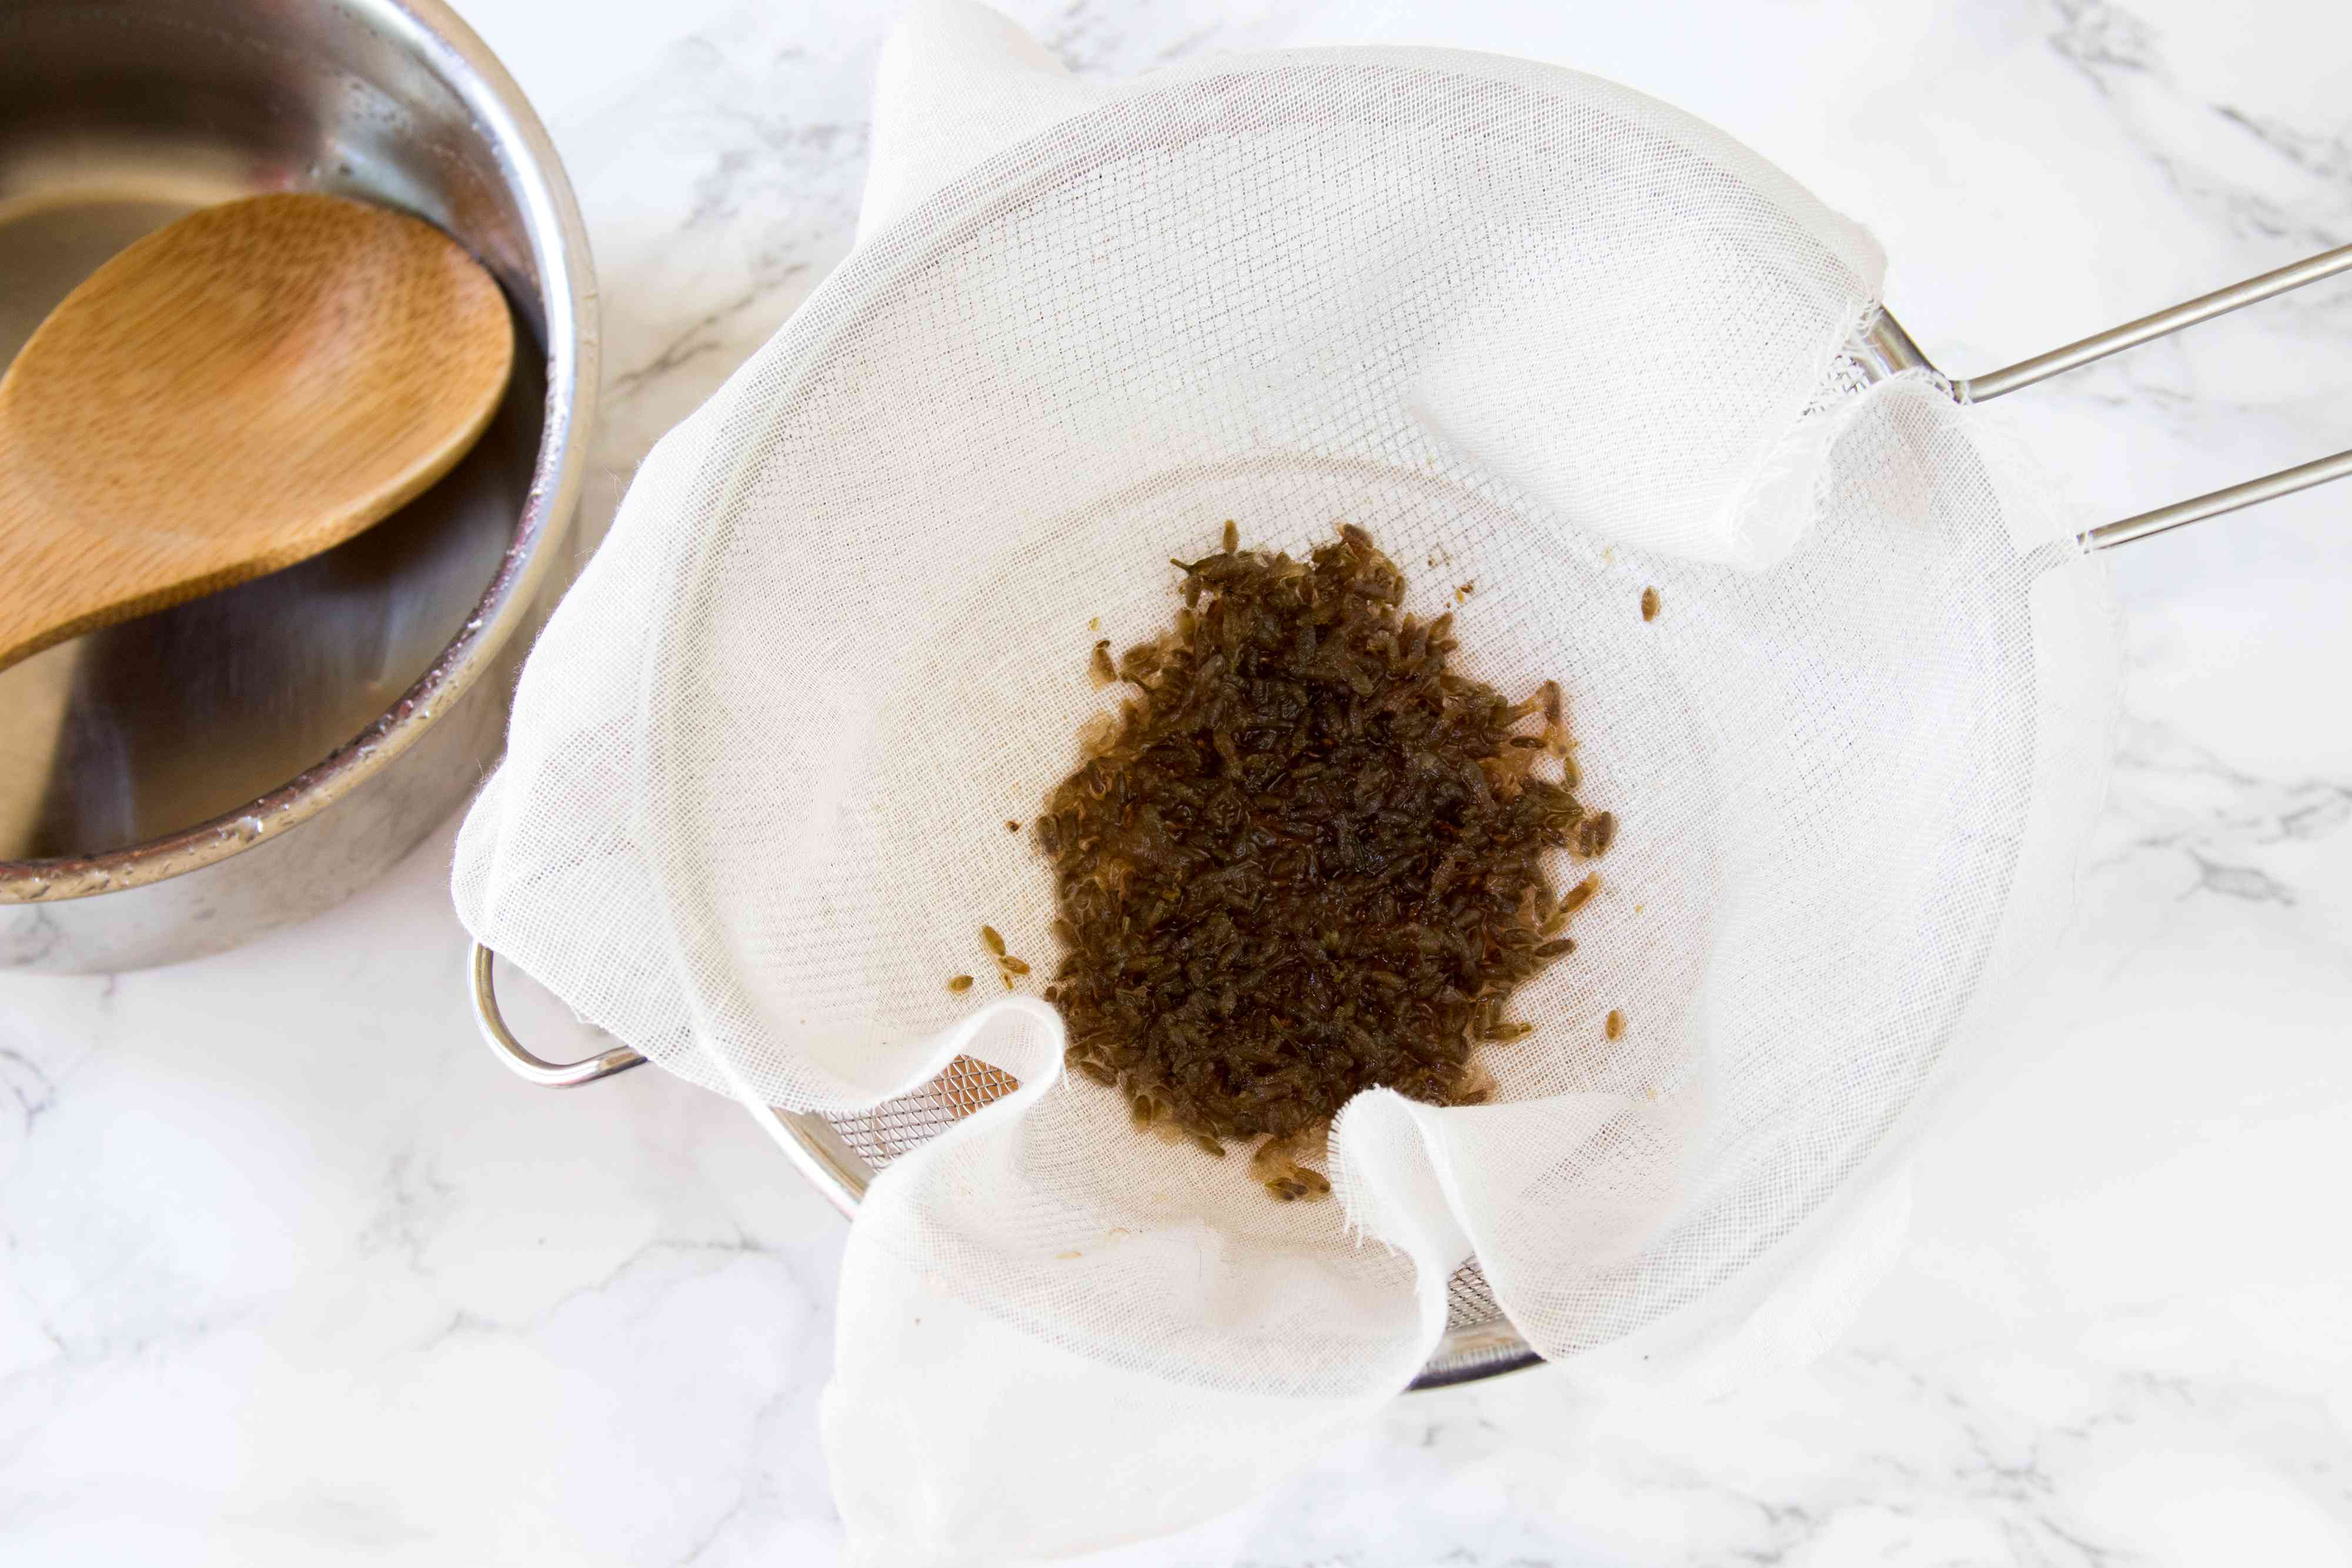 Straining Lavender Buds from Lavender Honey Syrup